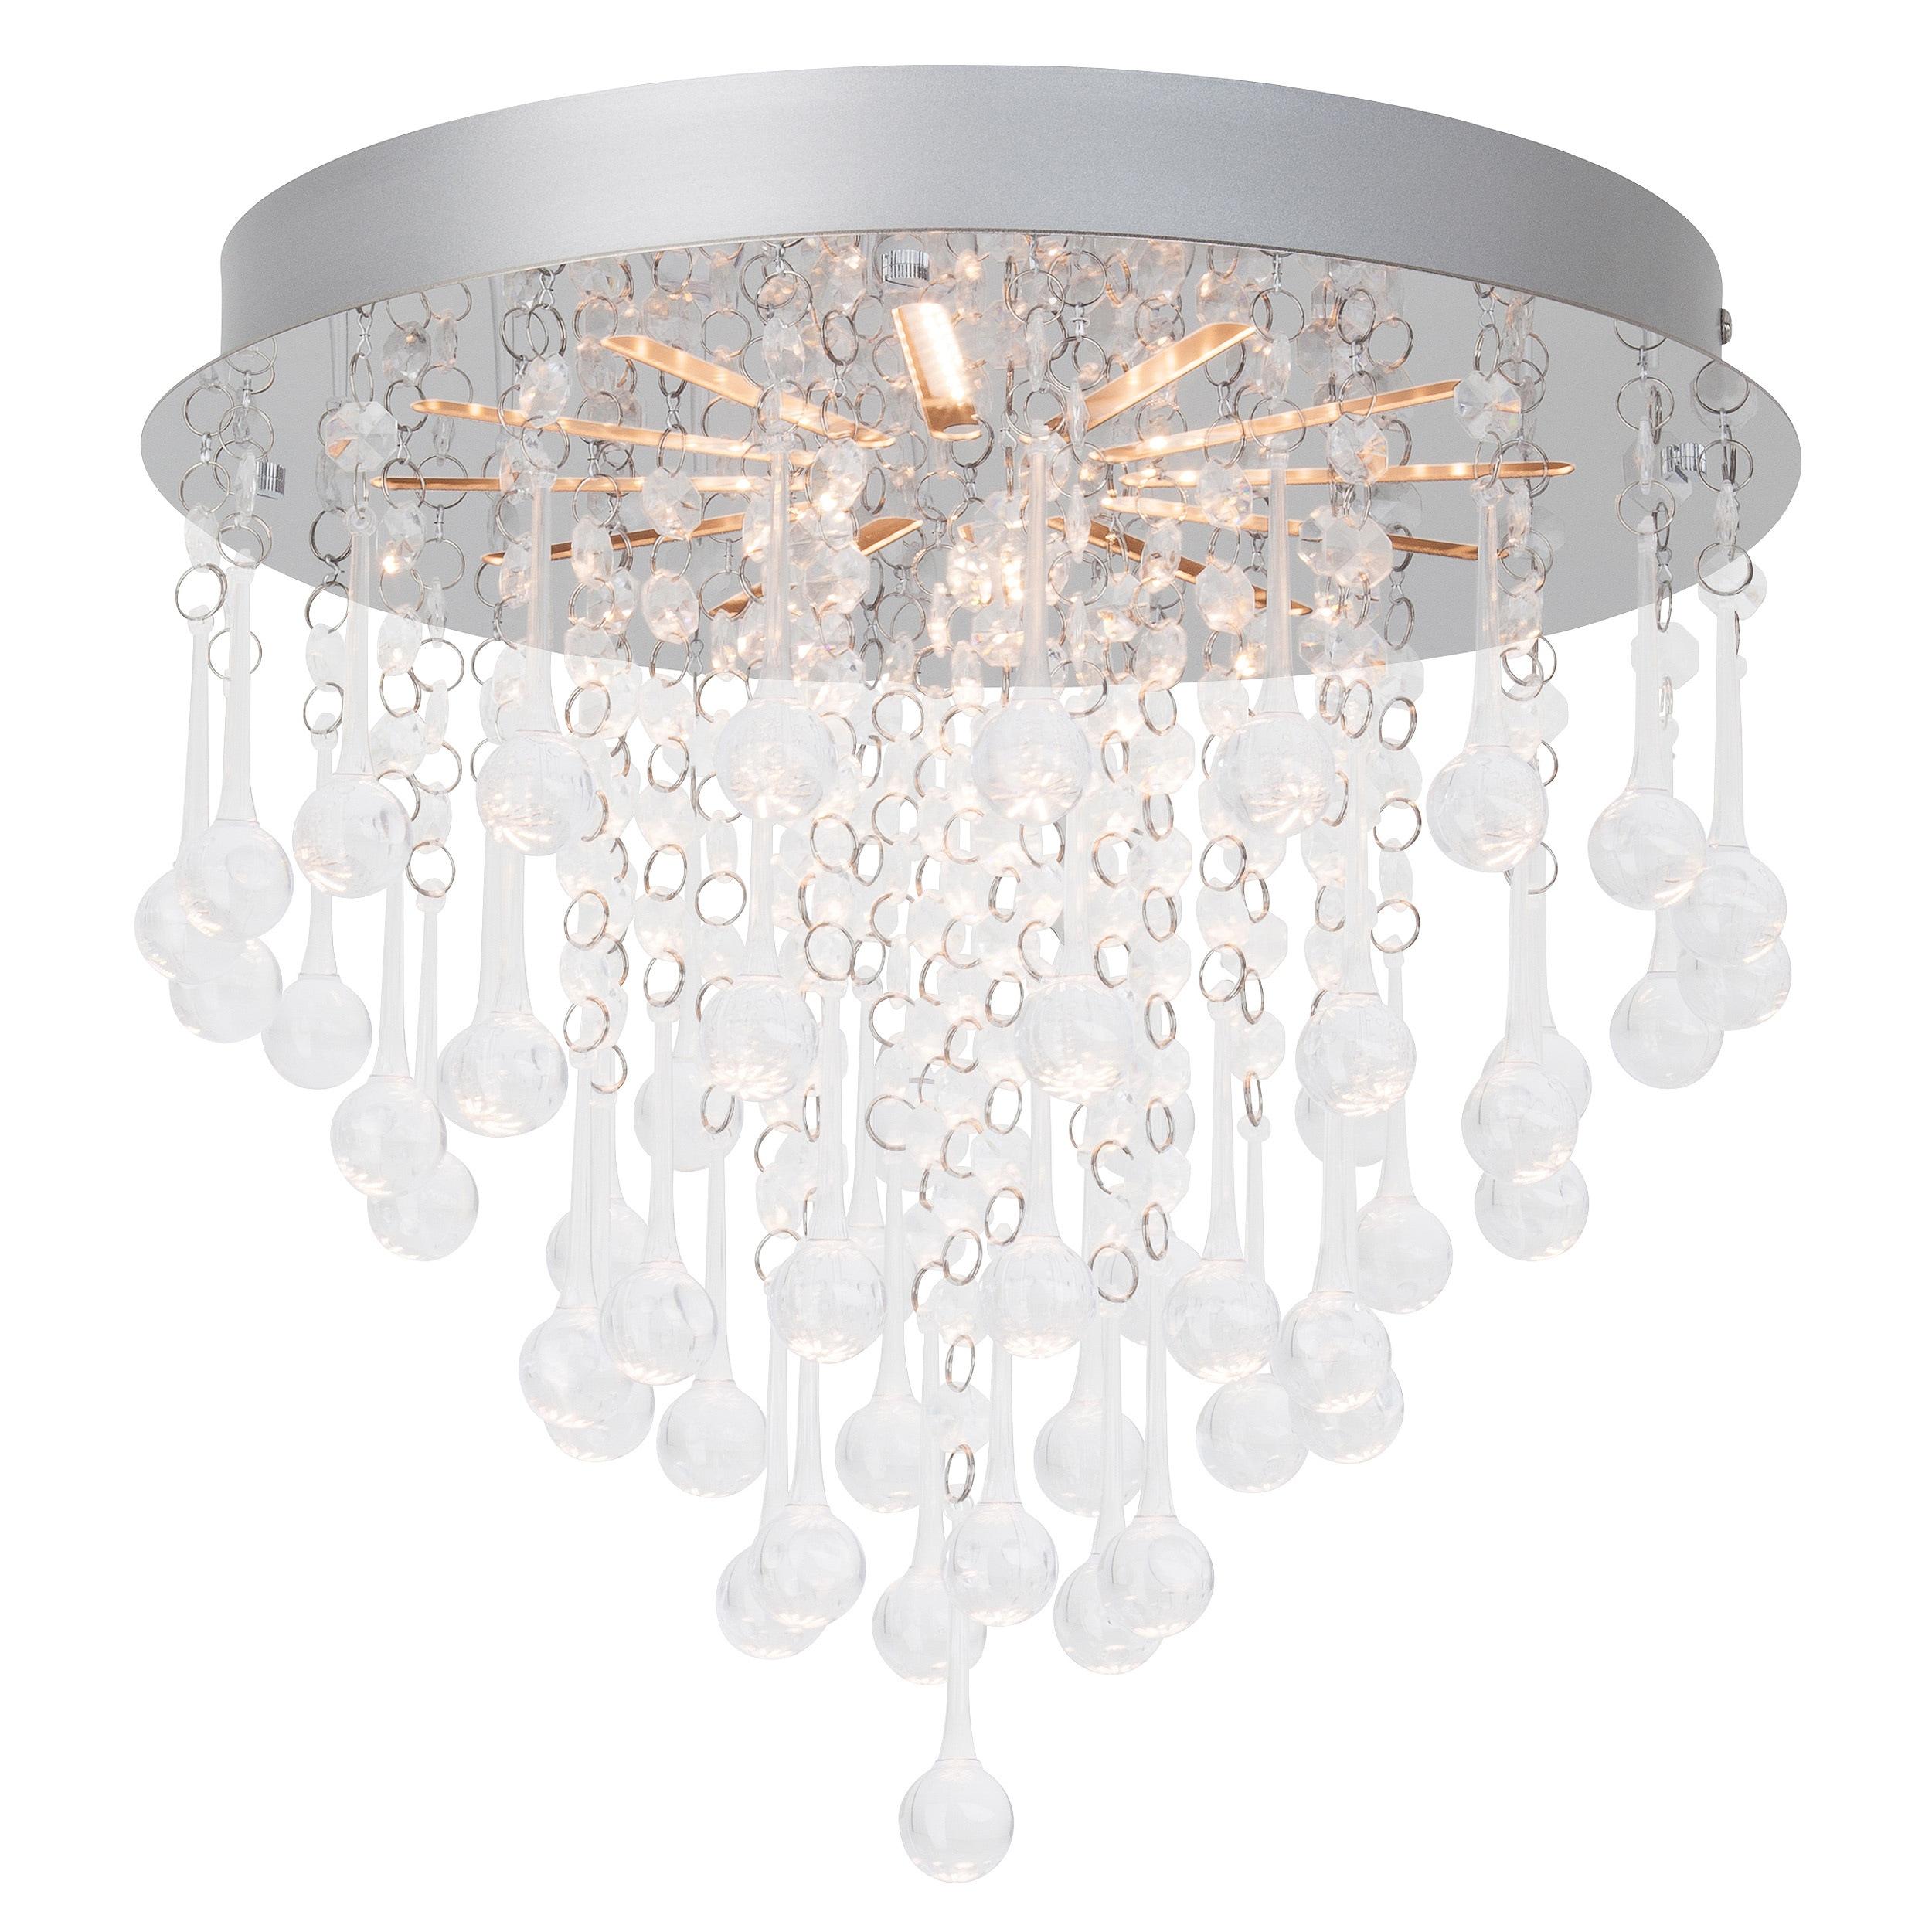 Brilliant Leuchten Svea LED Deckenleuchte 33cm chrom/transparent